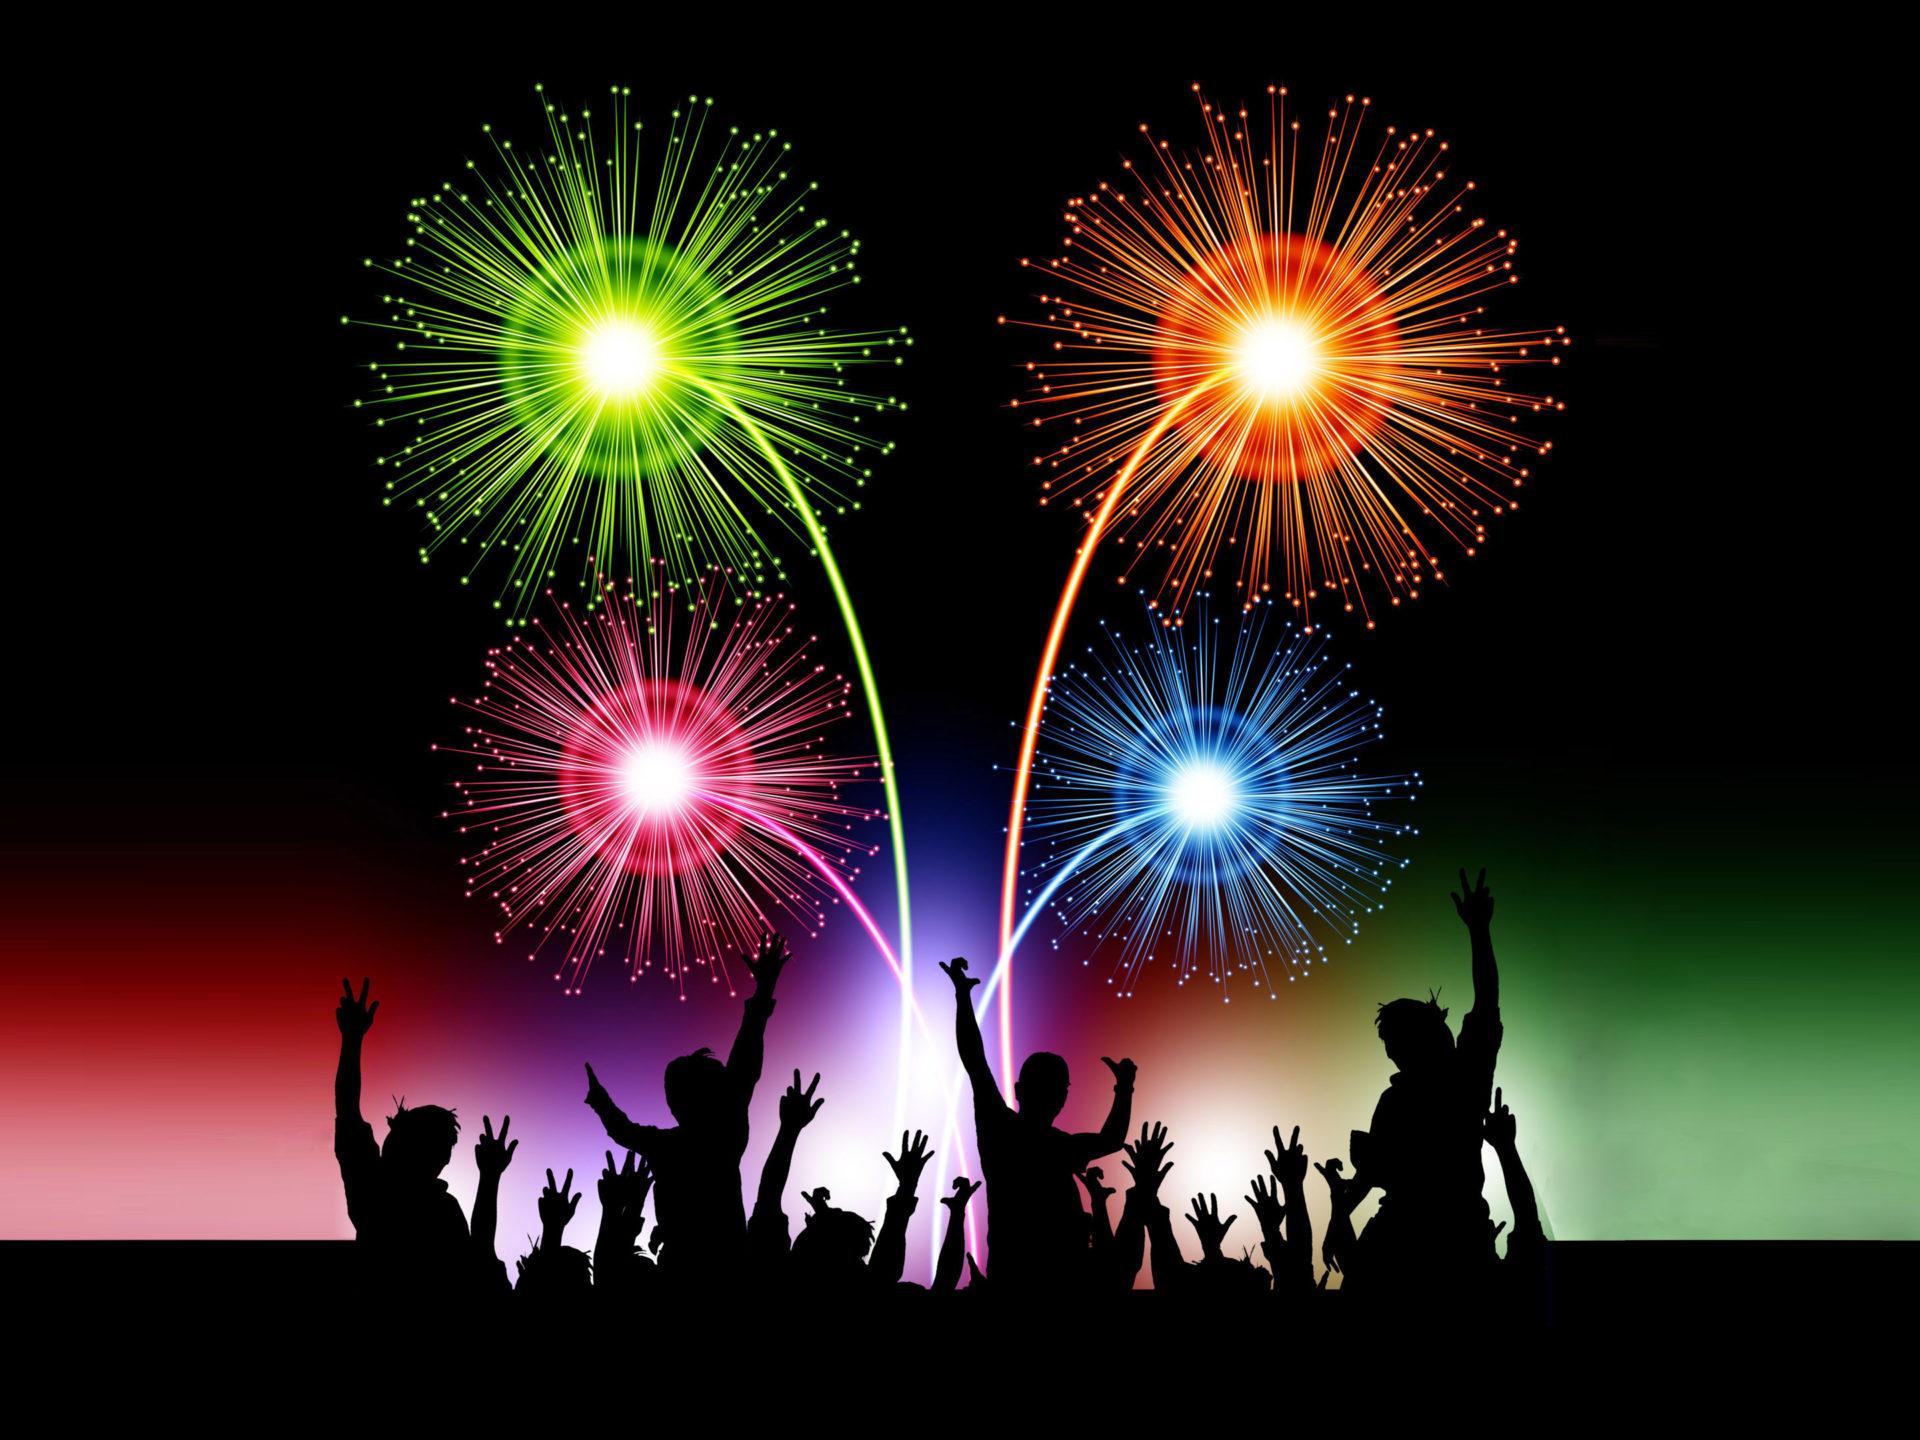 Happy New Year 2020 Celebration Animated 3d Fireworks Desktop Hd 1920x1440